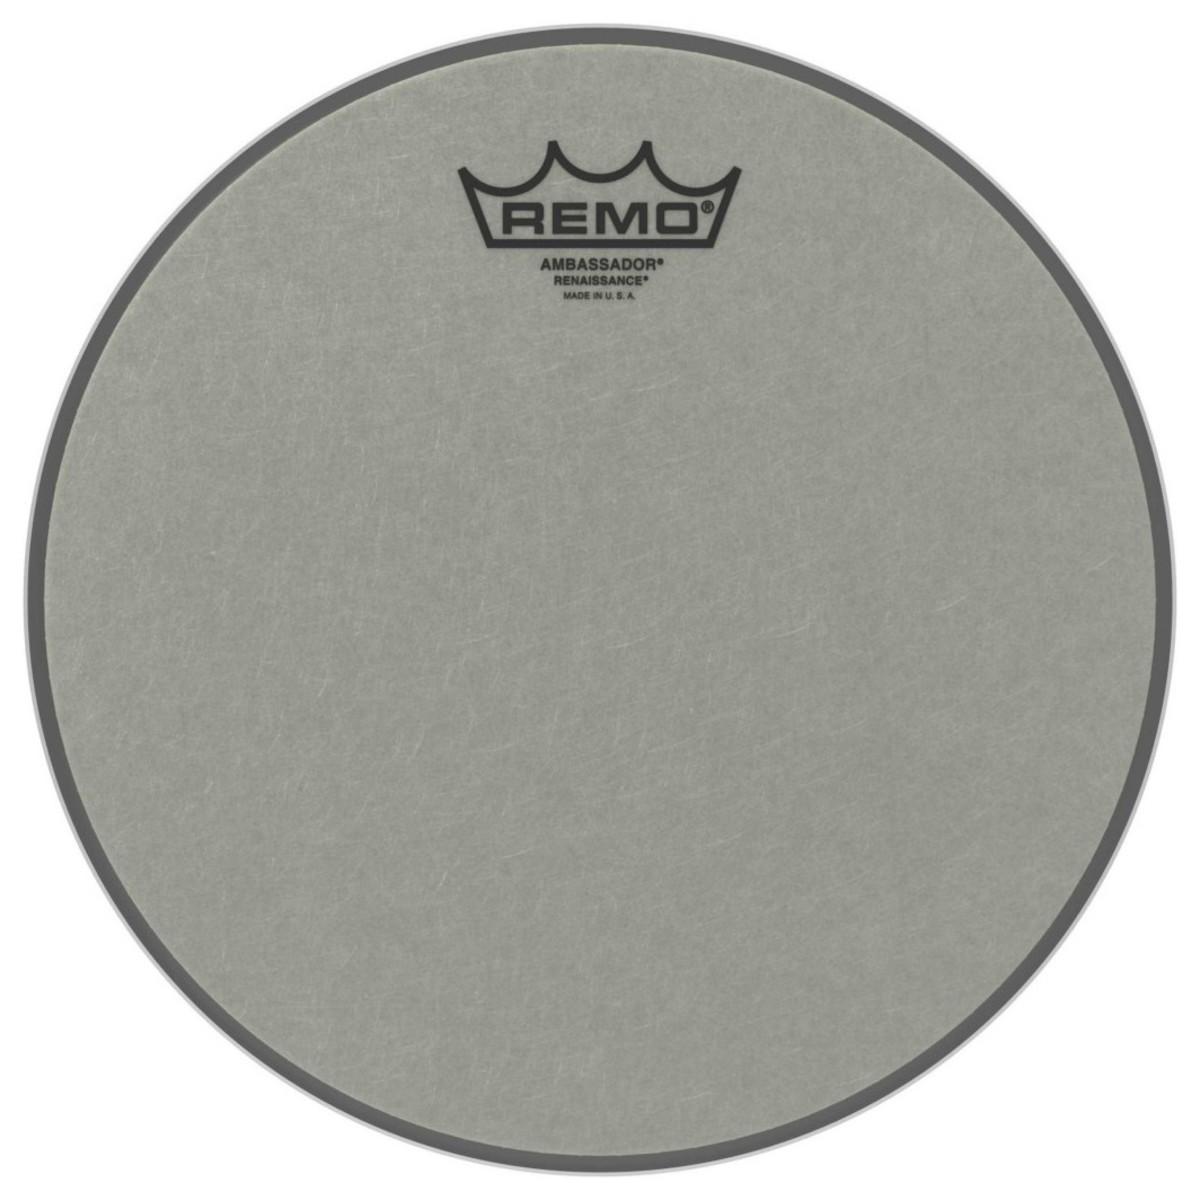 Remo Ambassador Renaissance 10 Drum Head